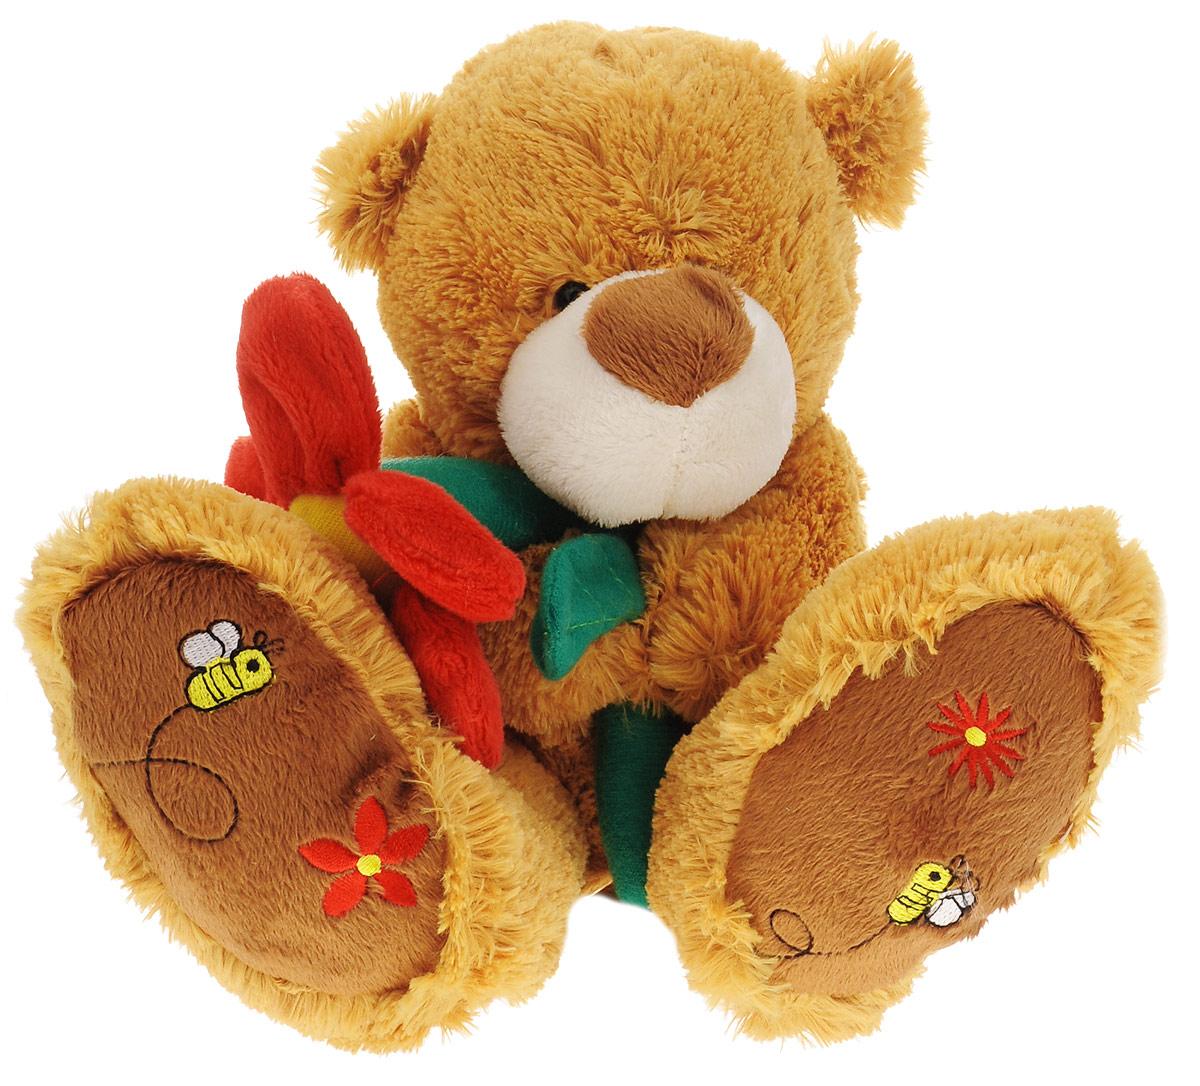 Magic Bear Toys Мягкая игрушка Медведь с цветком 30 см magic bear toys мягкая игрушка ослик чарли 27 см